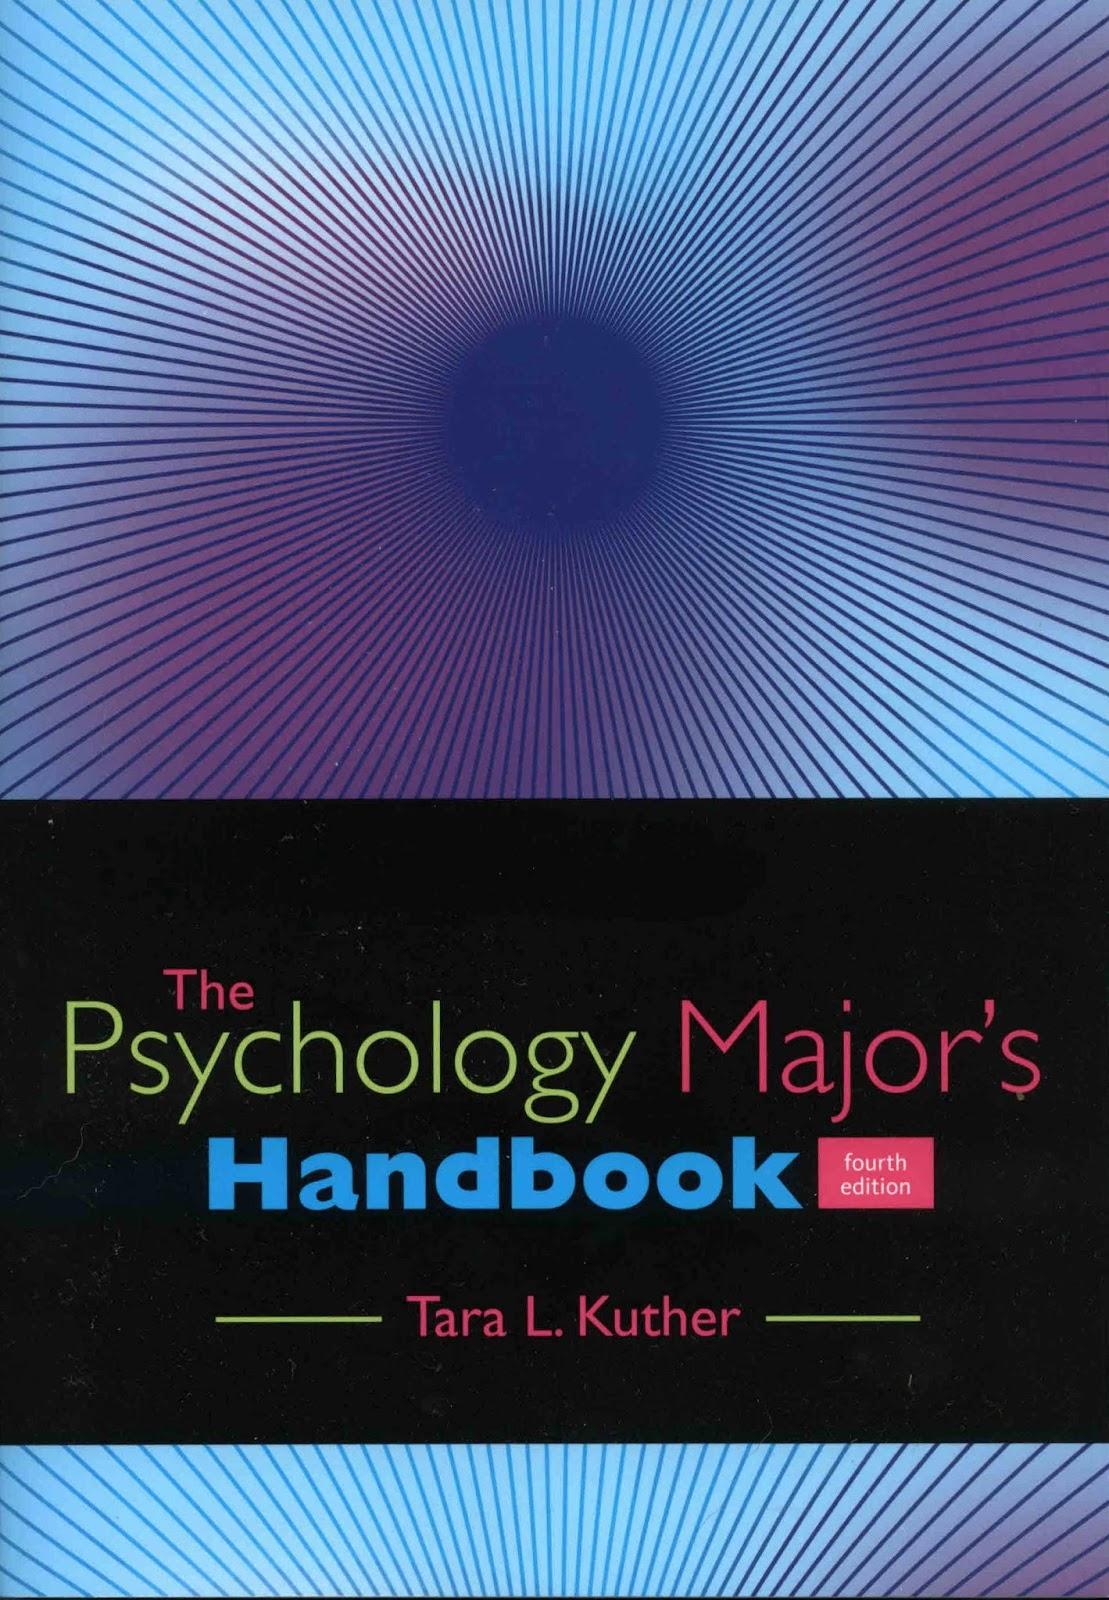 Need info on psychology career!?